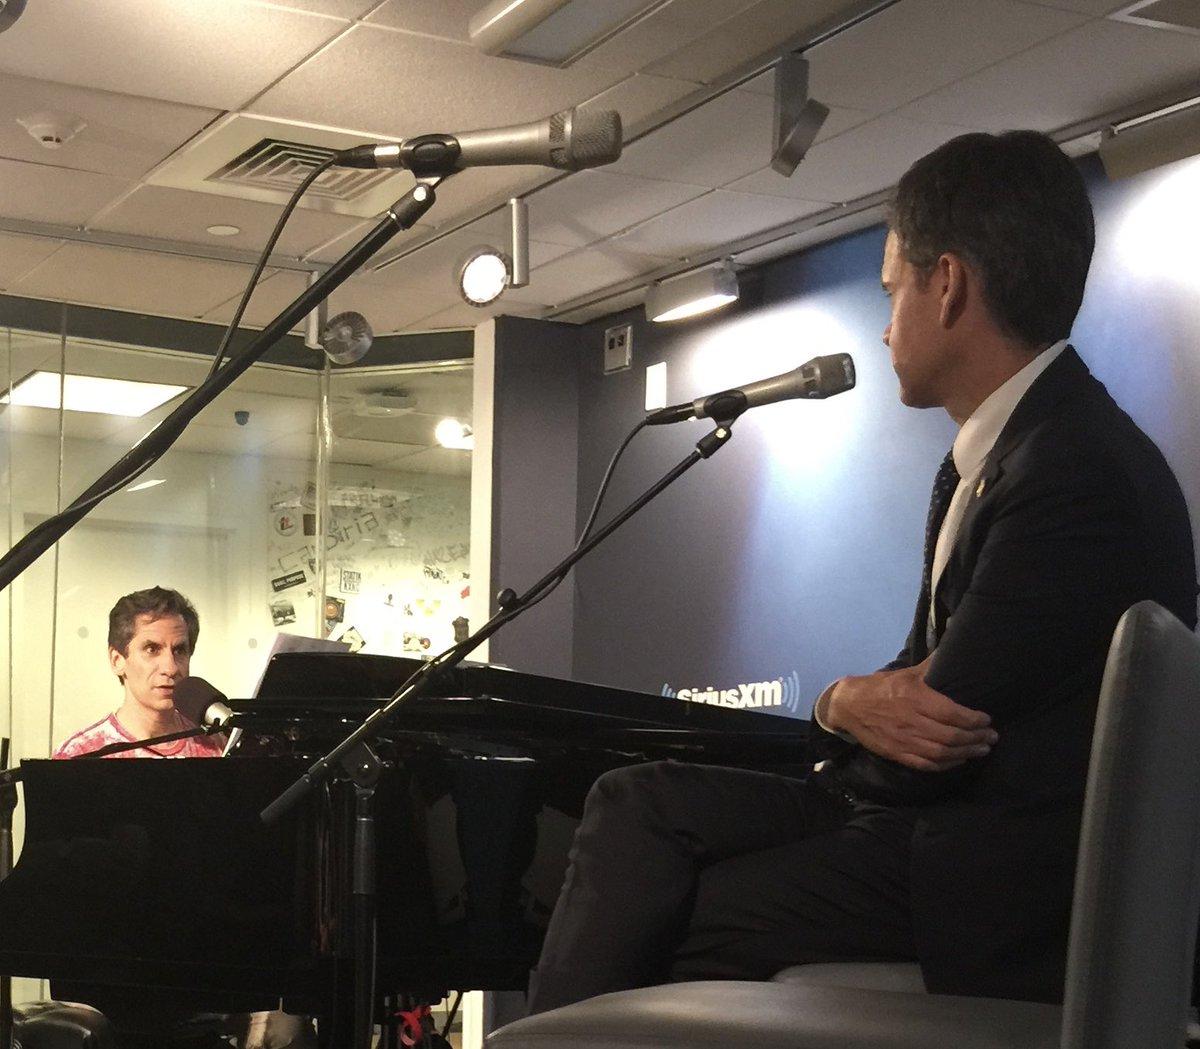 @SarahKSilverman @SethRudetsky Meeting Seth was like looking into a mirror